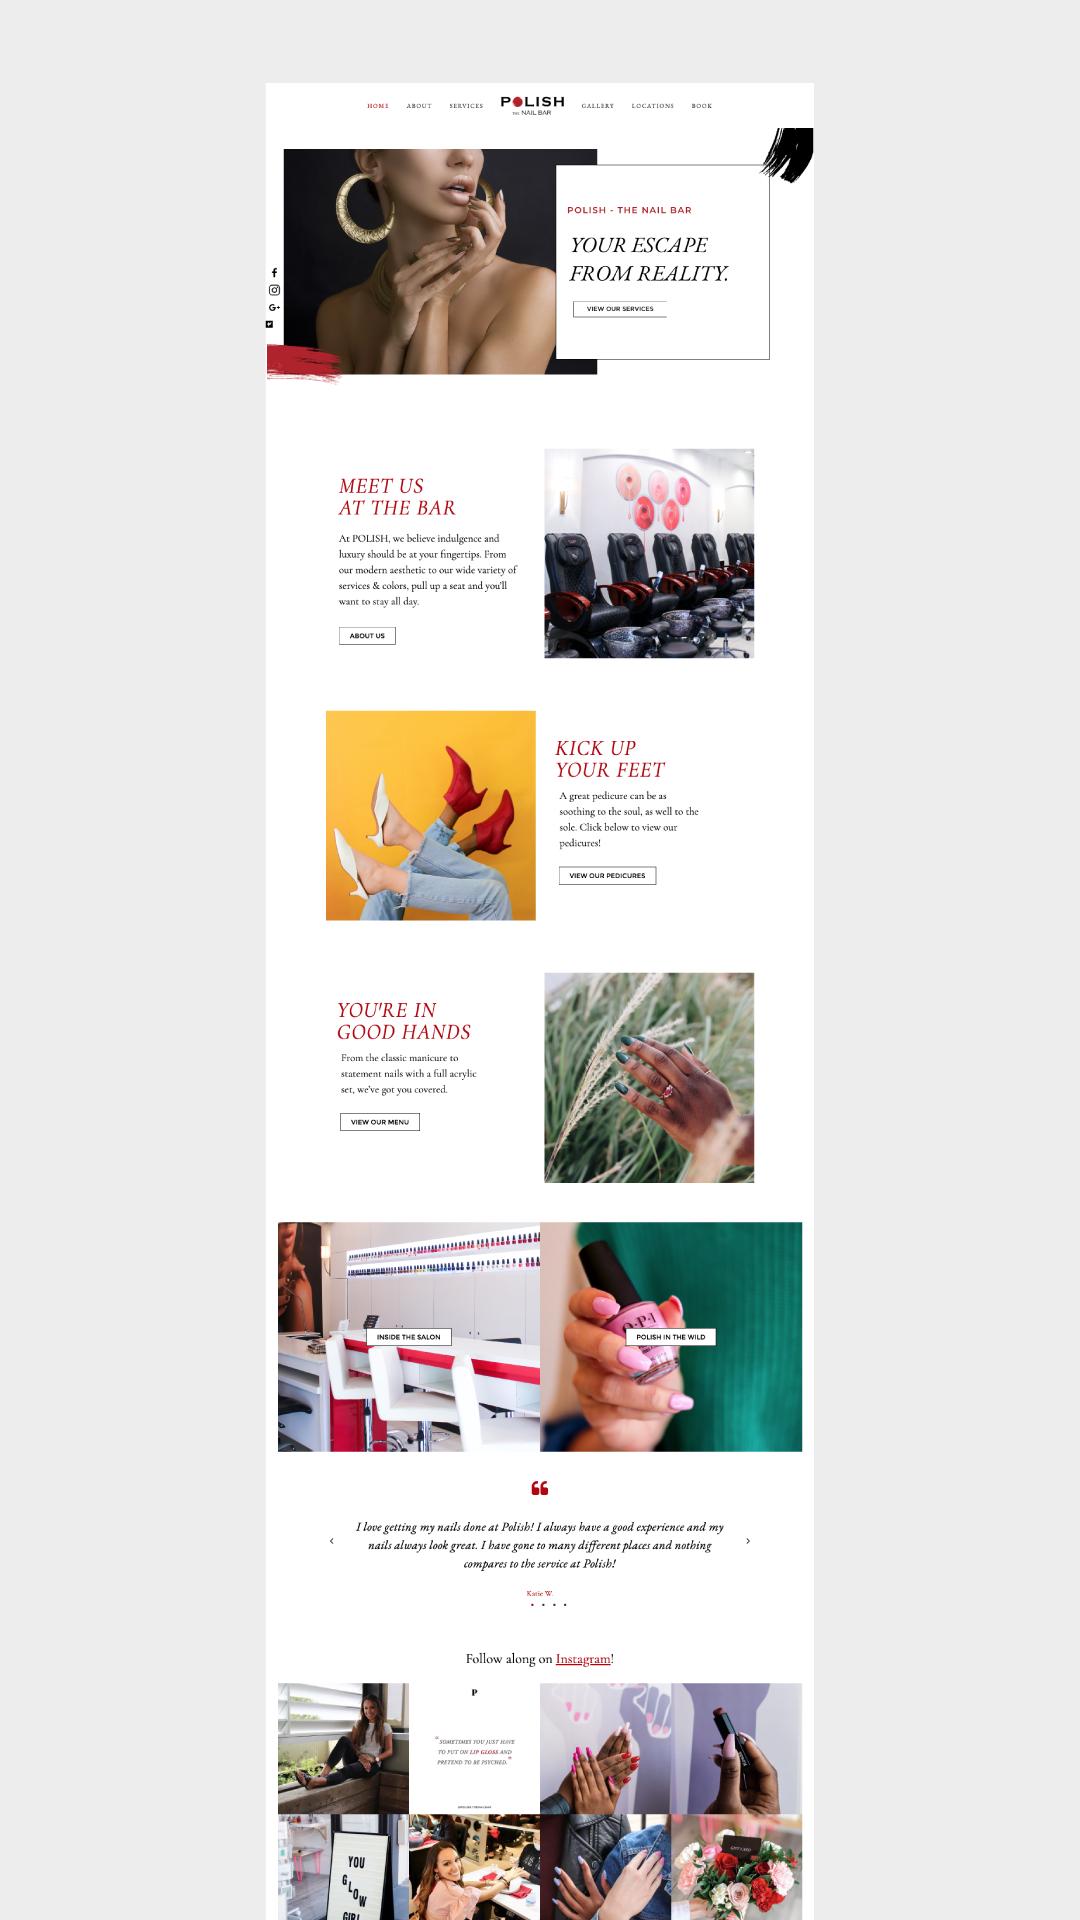 Squarespace Website Design Services – POLISH The Nail Bar